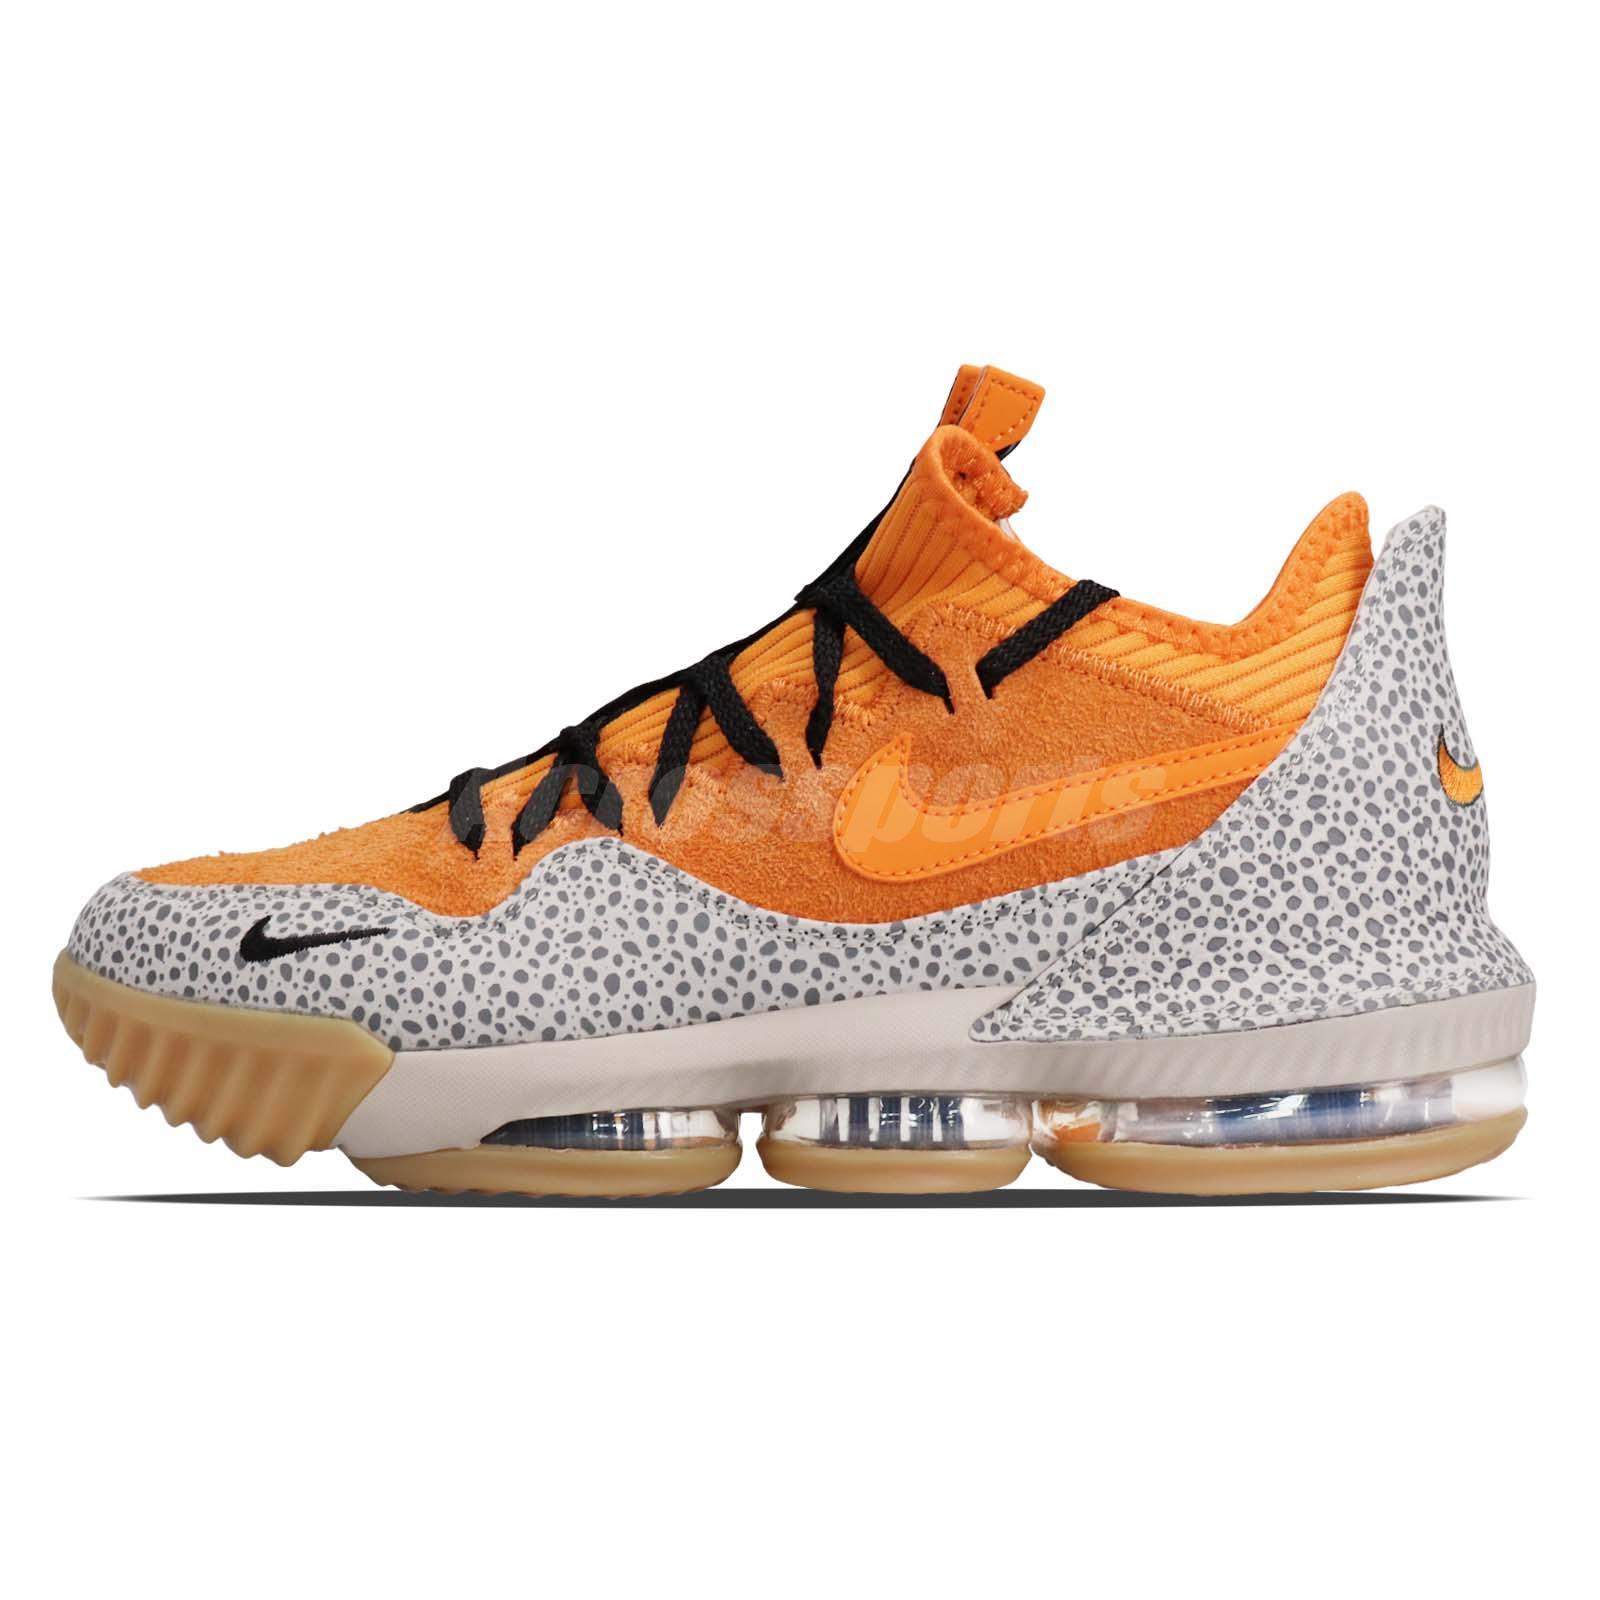 c606b97c42d Nike Lebron XVI Low AC EP 16 James LBJ Atmos Safari Kumquat Men Shoes  CI3358-800